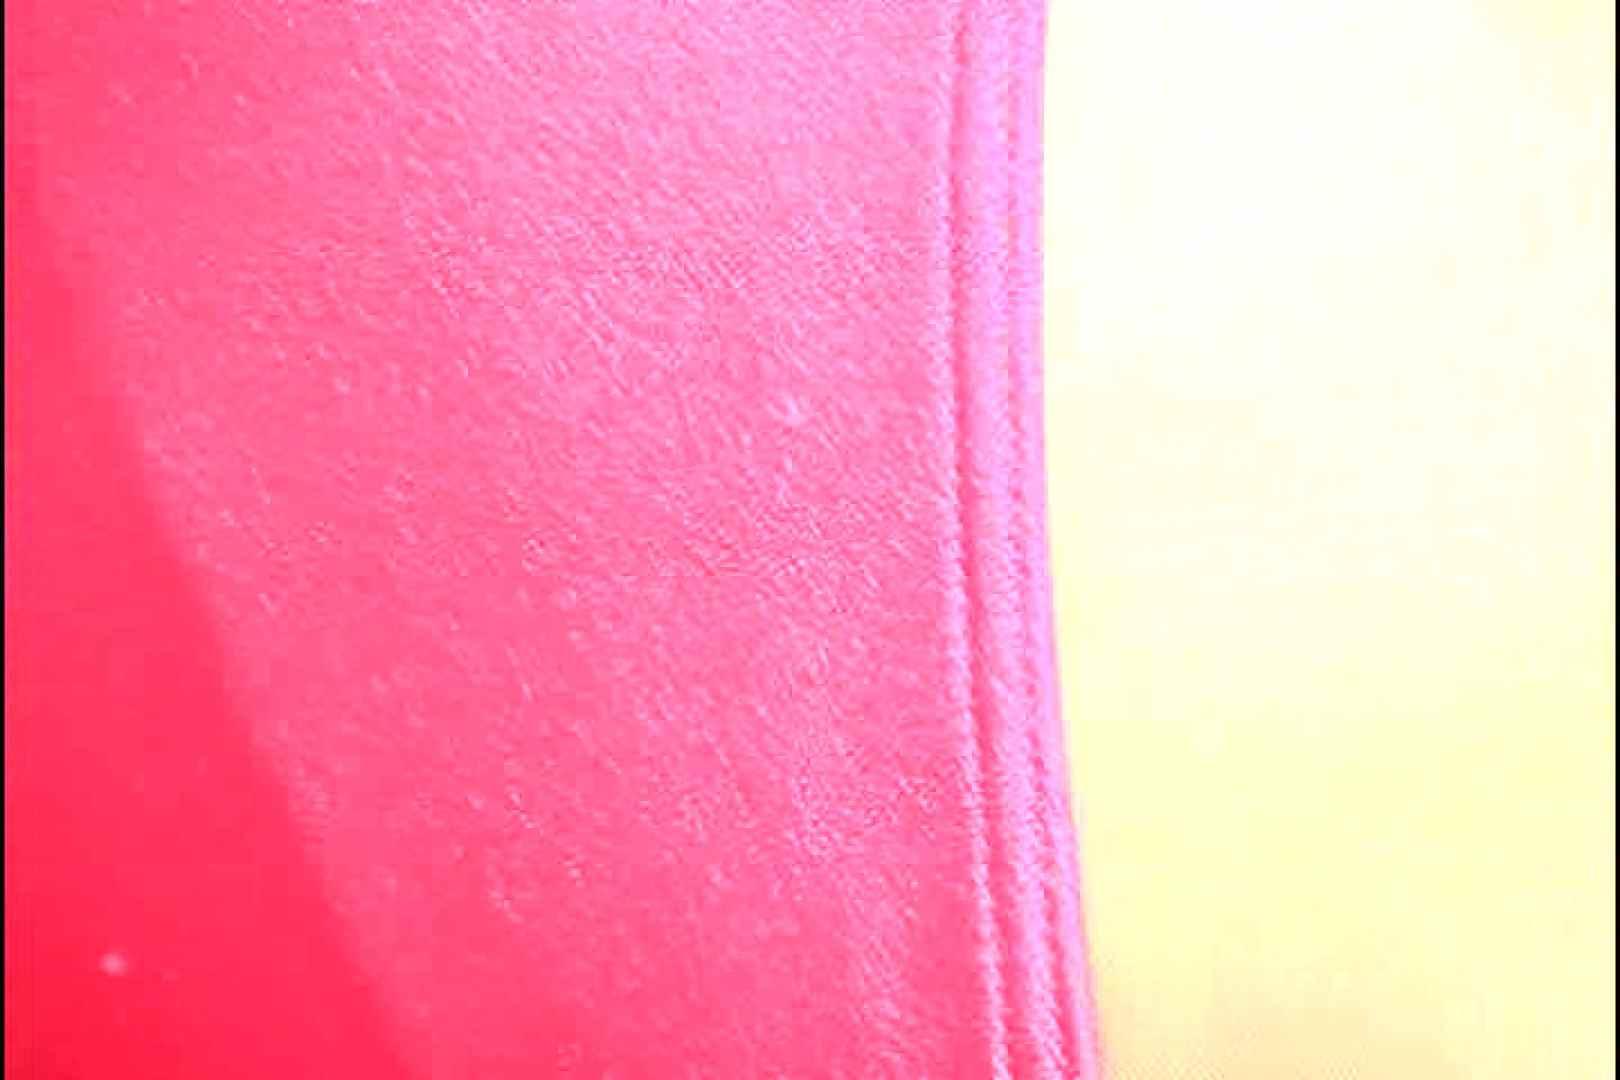 RQカメラ地獄Vol.13 レースクイーン 盗撮おめこ無修正動画無料 95画像 9